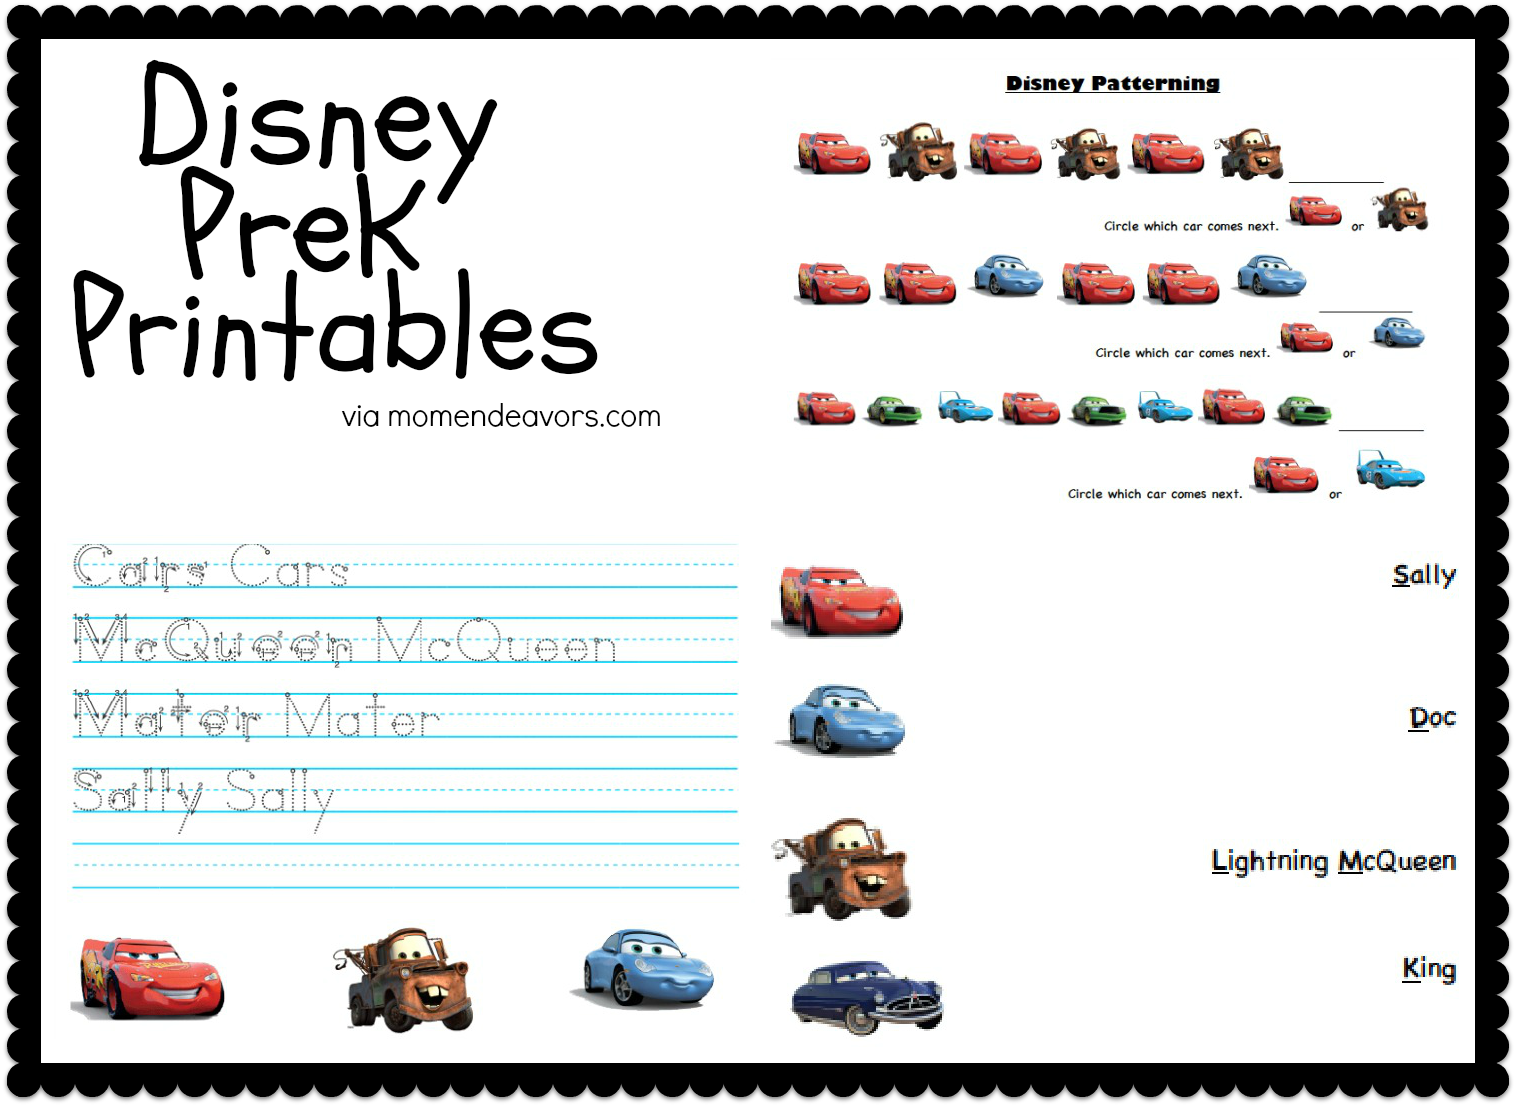 disney pixar cars prek printable activity sheets disney free printables - Activity Printables